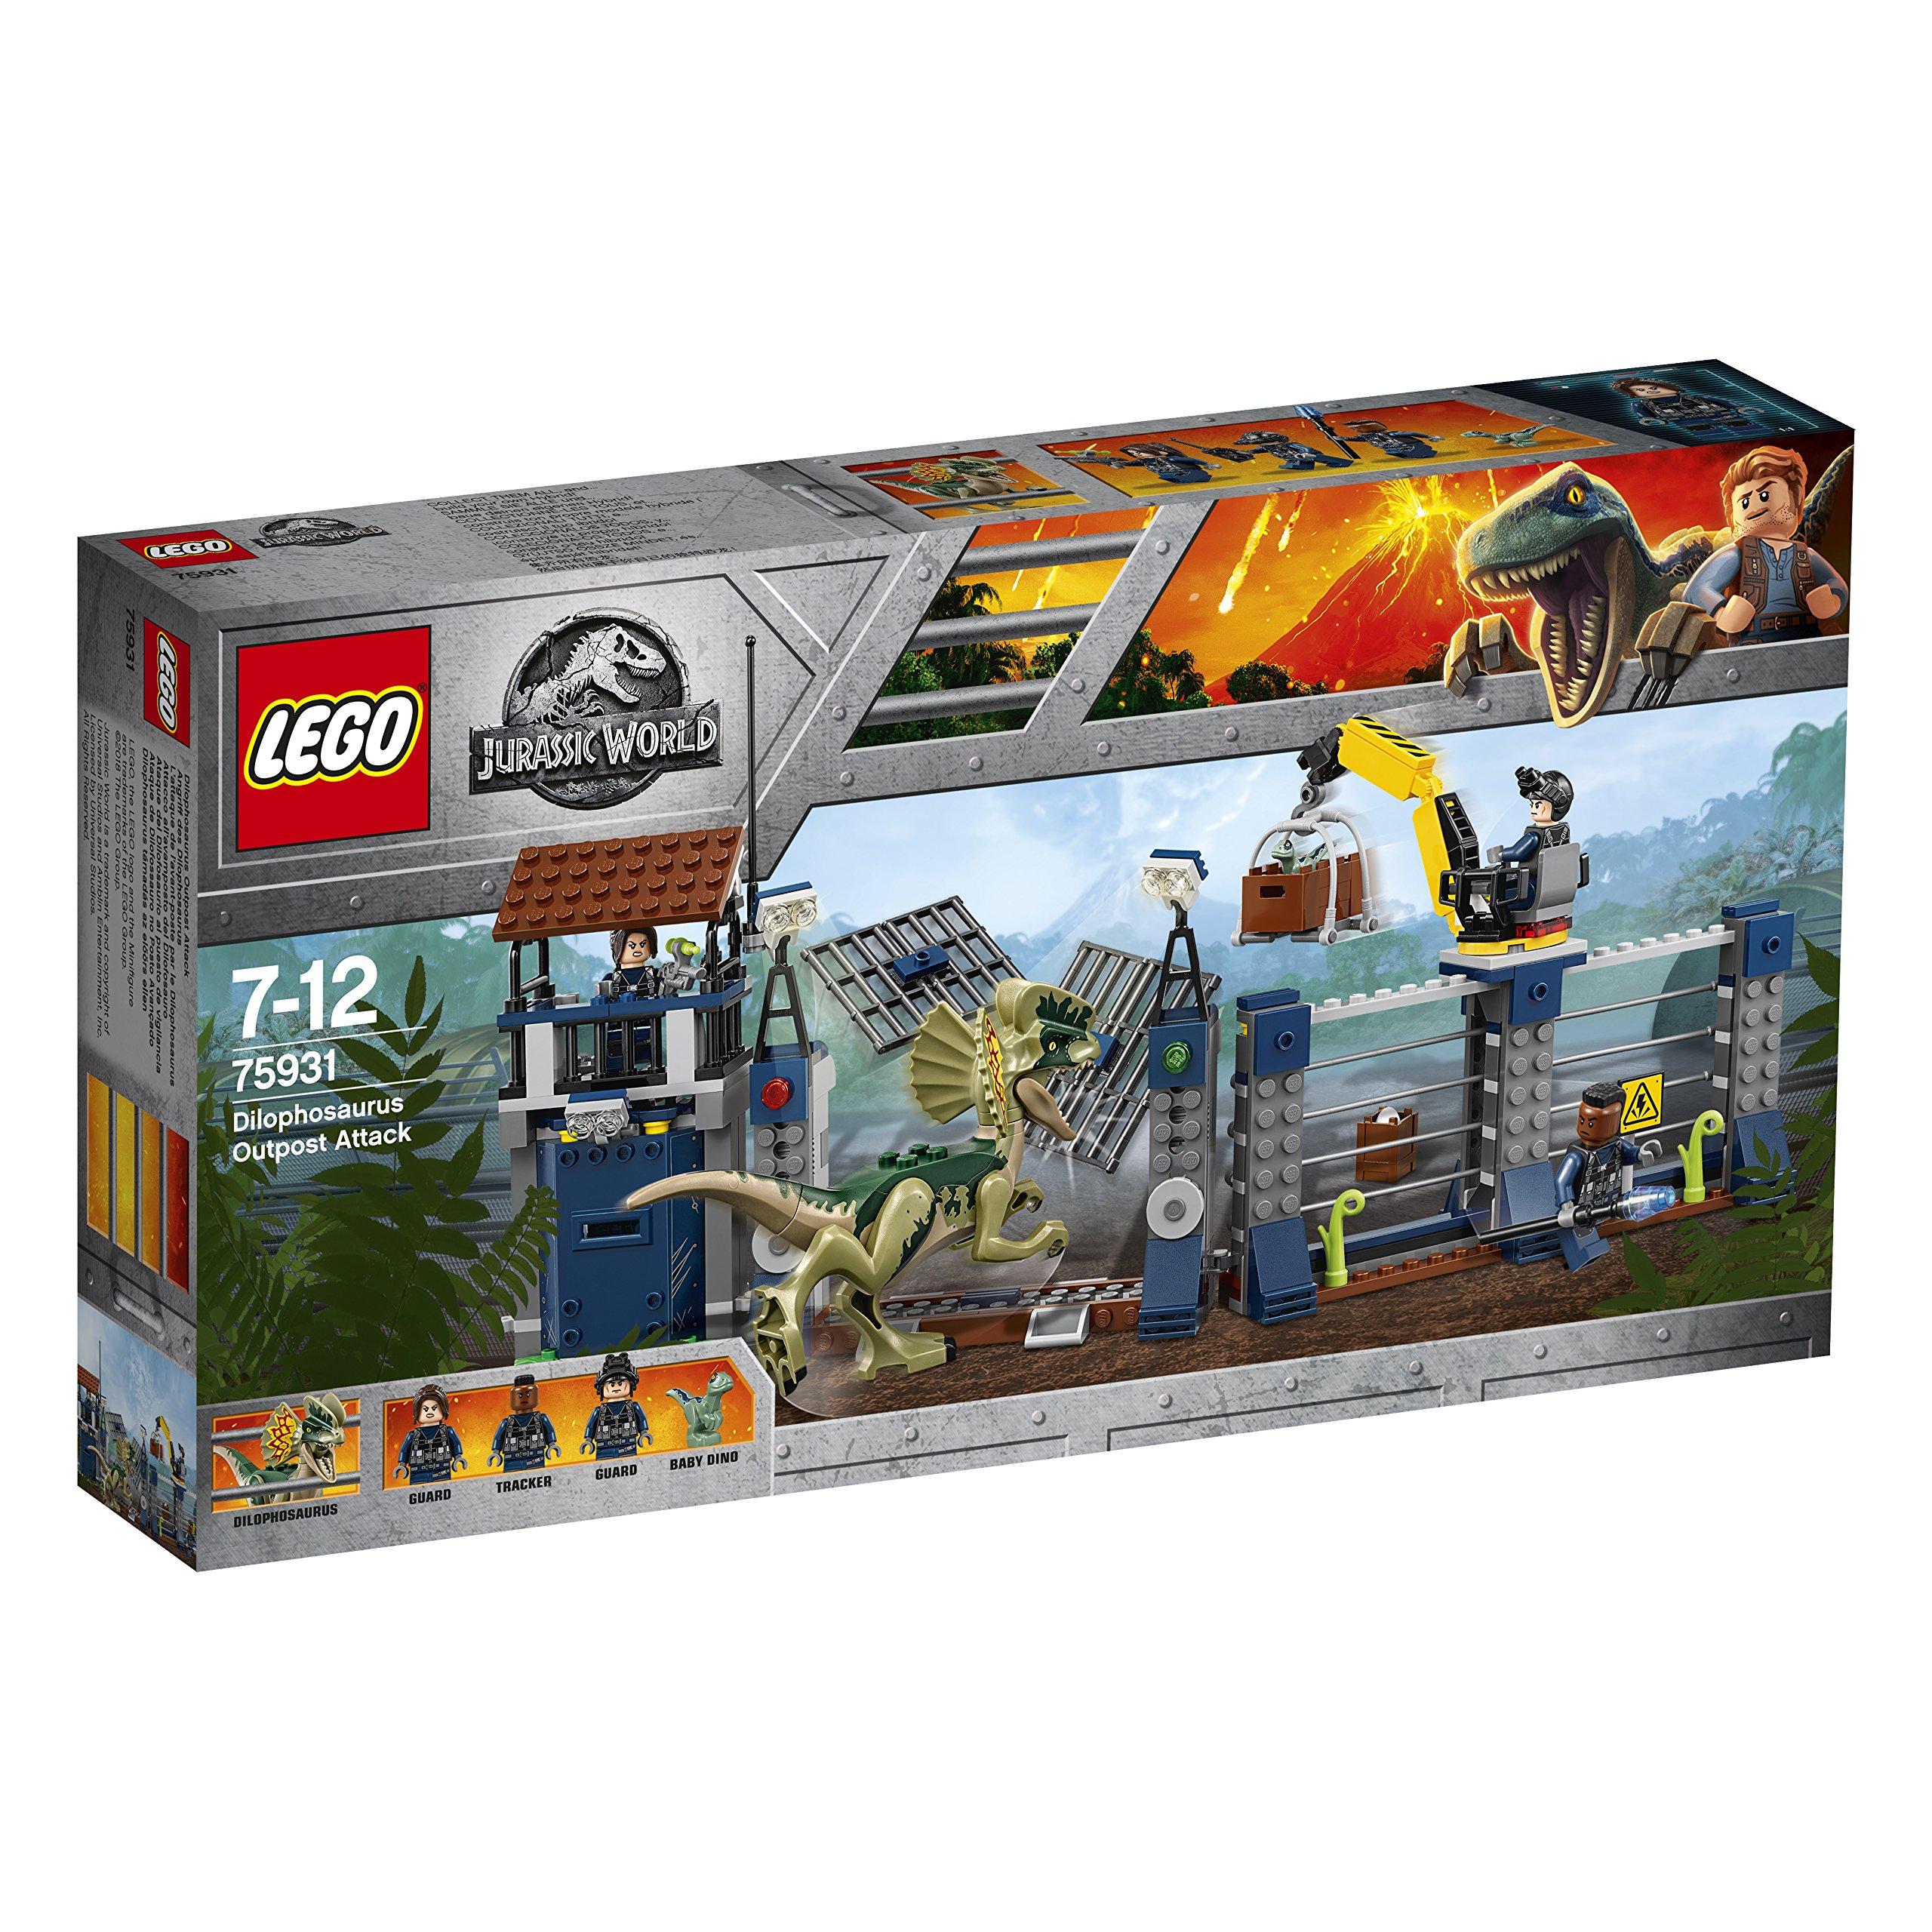 LEGO 75931 Jurassic World Dilophosaurus Outpost Attack Playset, Dinosaur Figures, Build & Play Dinosaur Toys for Kids by LEGO (Image #3)